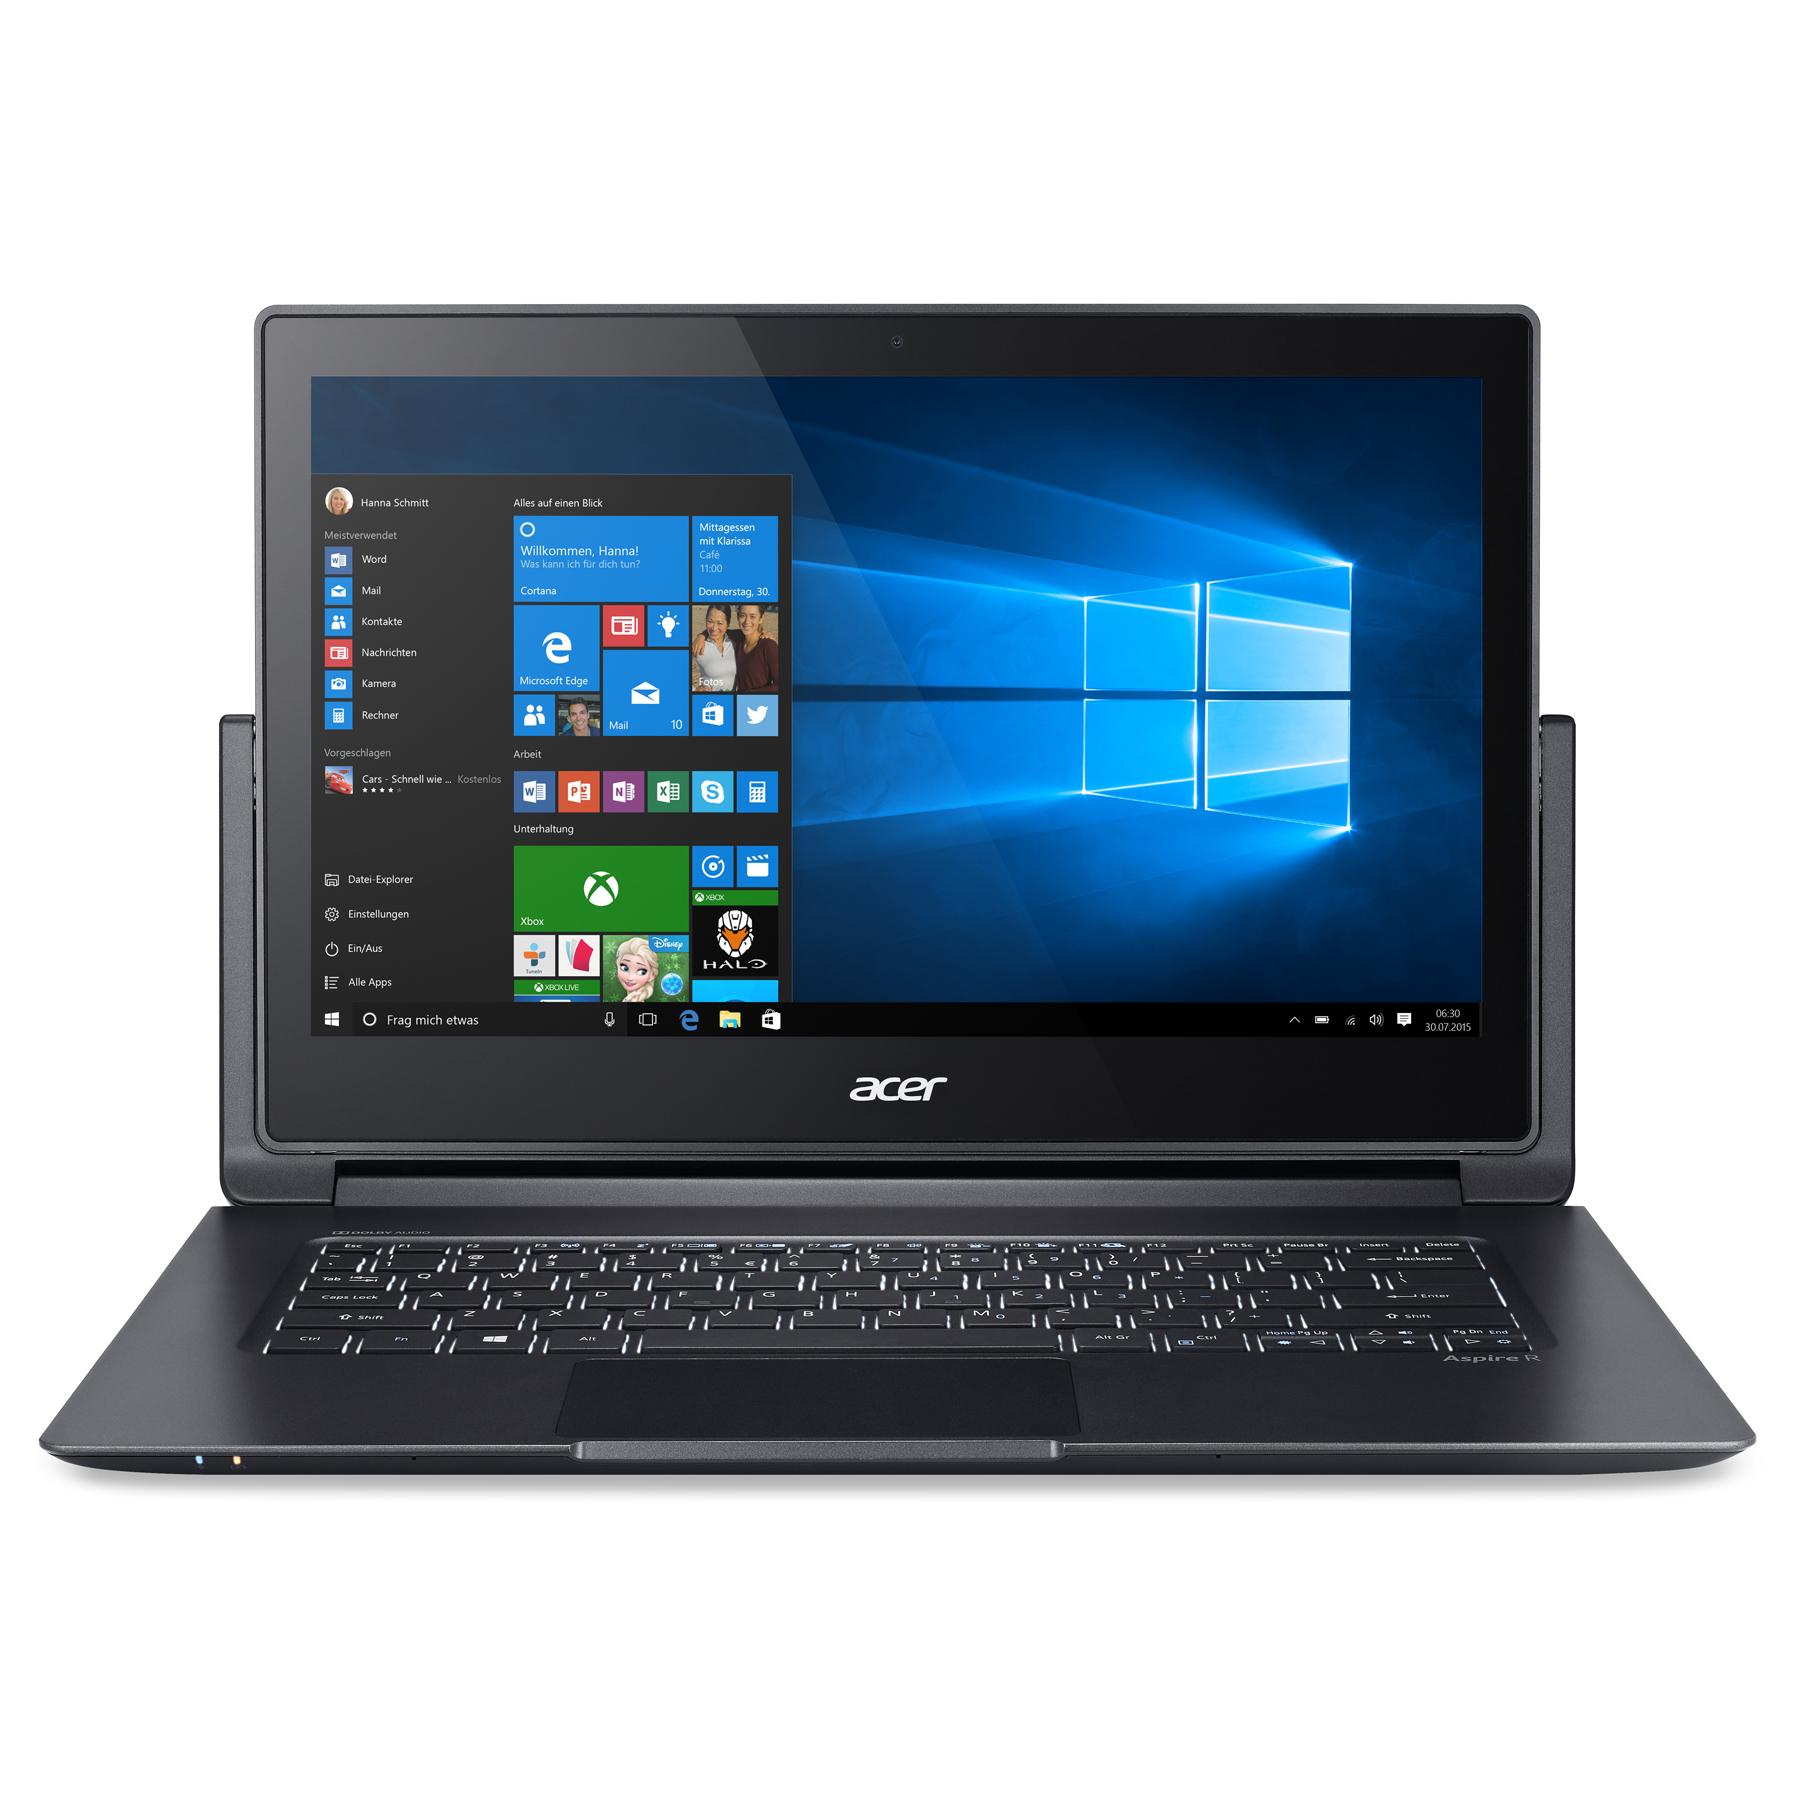 Acer Aspire R7-372T Windows 8 X64